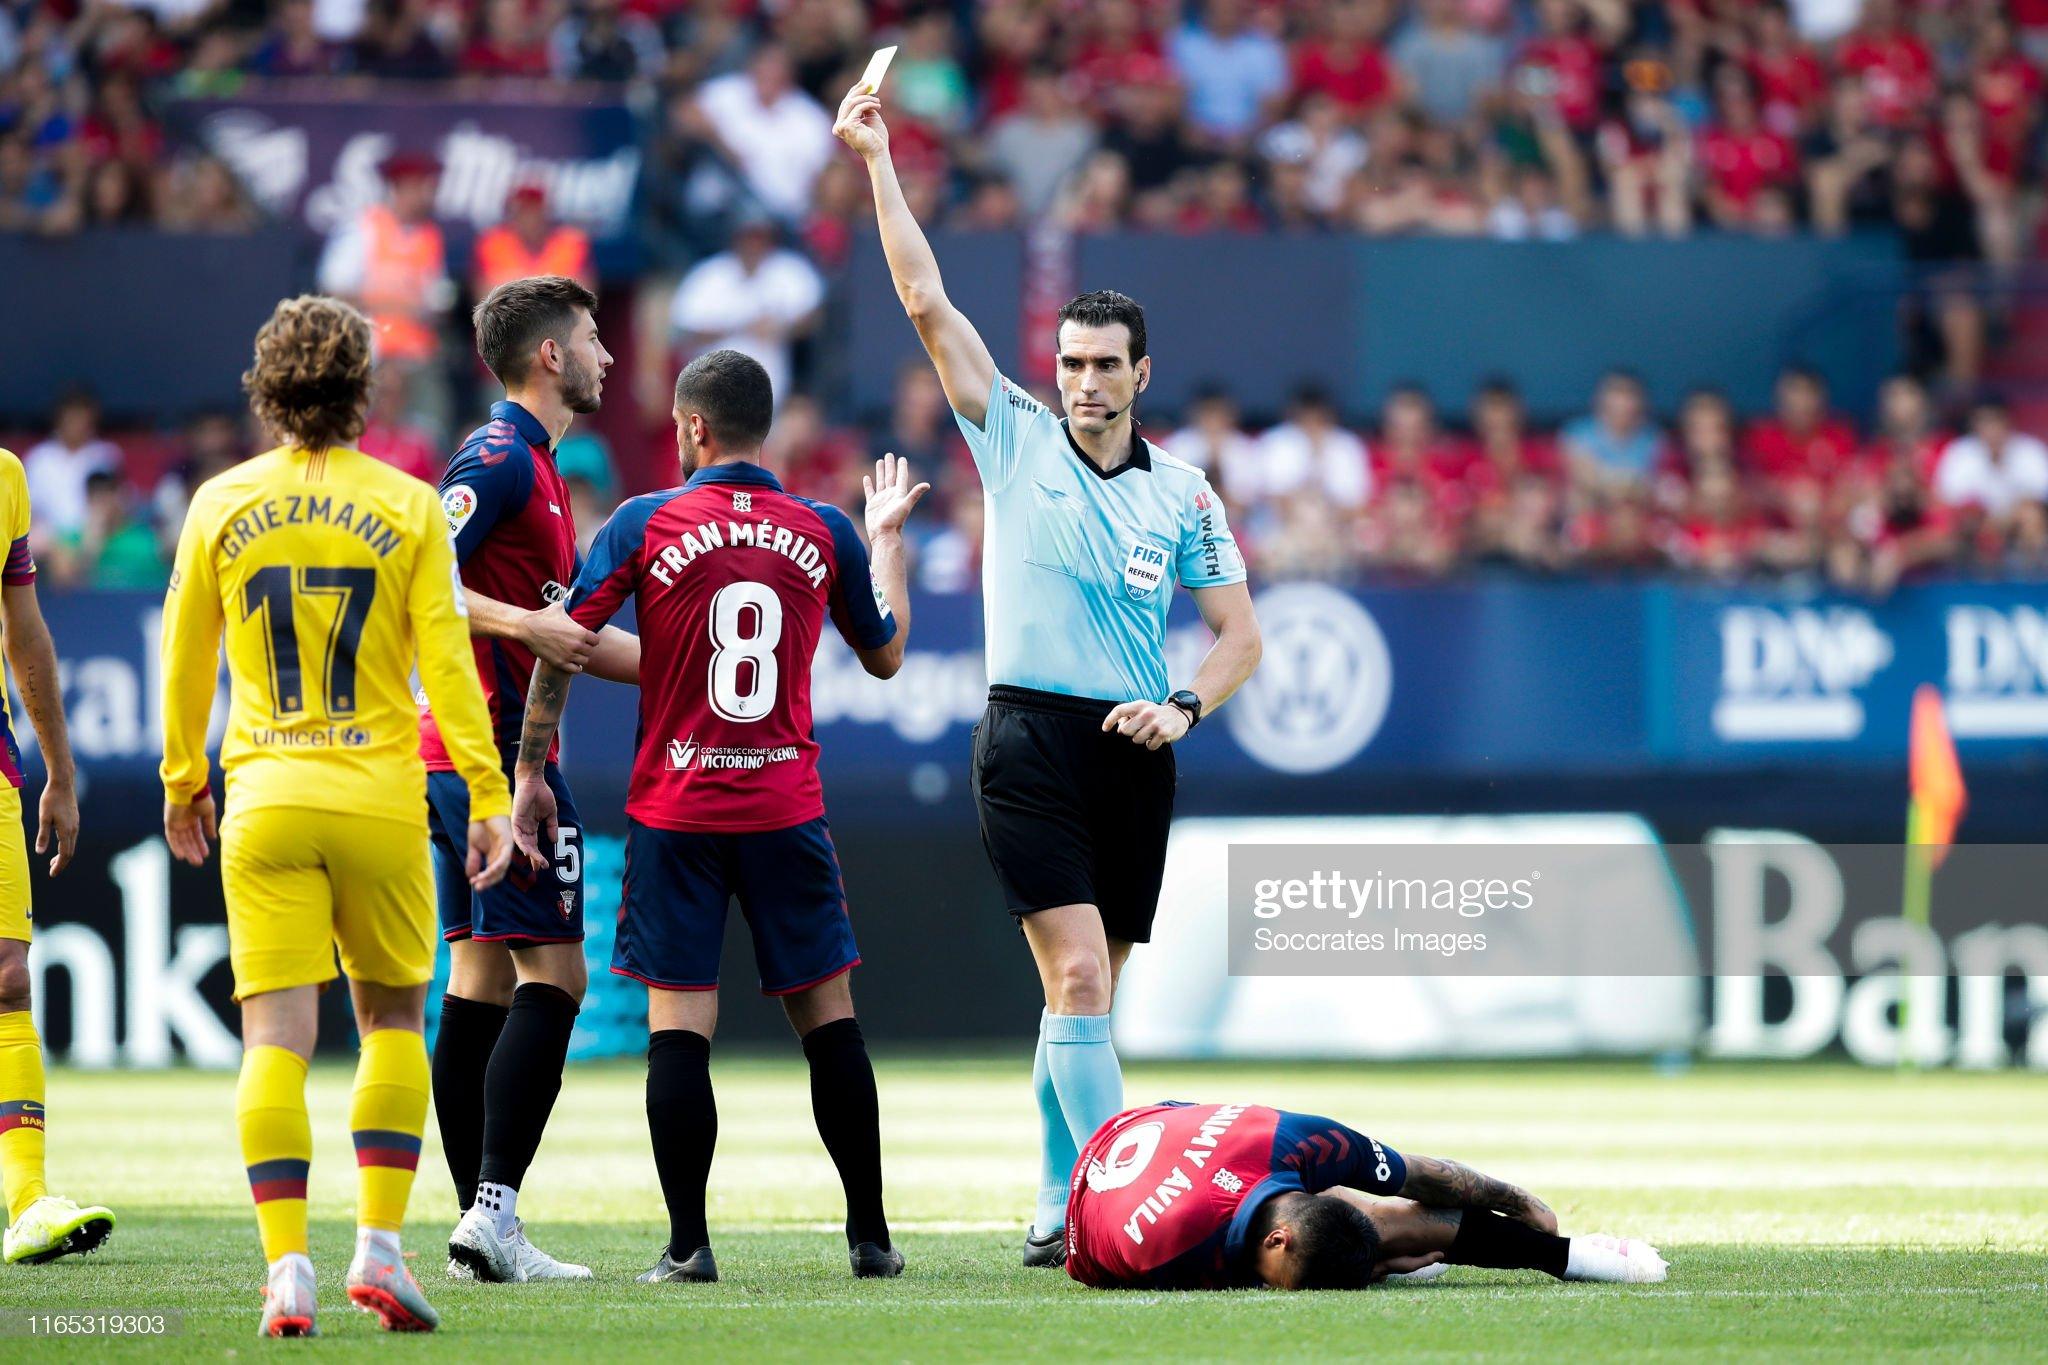 صور مباراة : أوساسونا - برشلونة 2-2 ( 31-08-2019 )  Fran-merida-of-ca-osasuna-referee-martinez-munuera-during-the-la-liga-picture-id1165319303?s=2048x2048